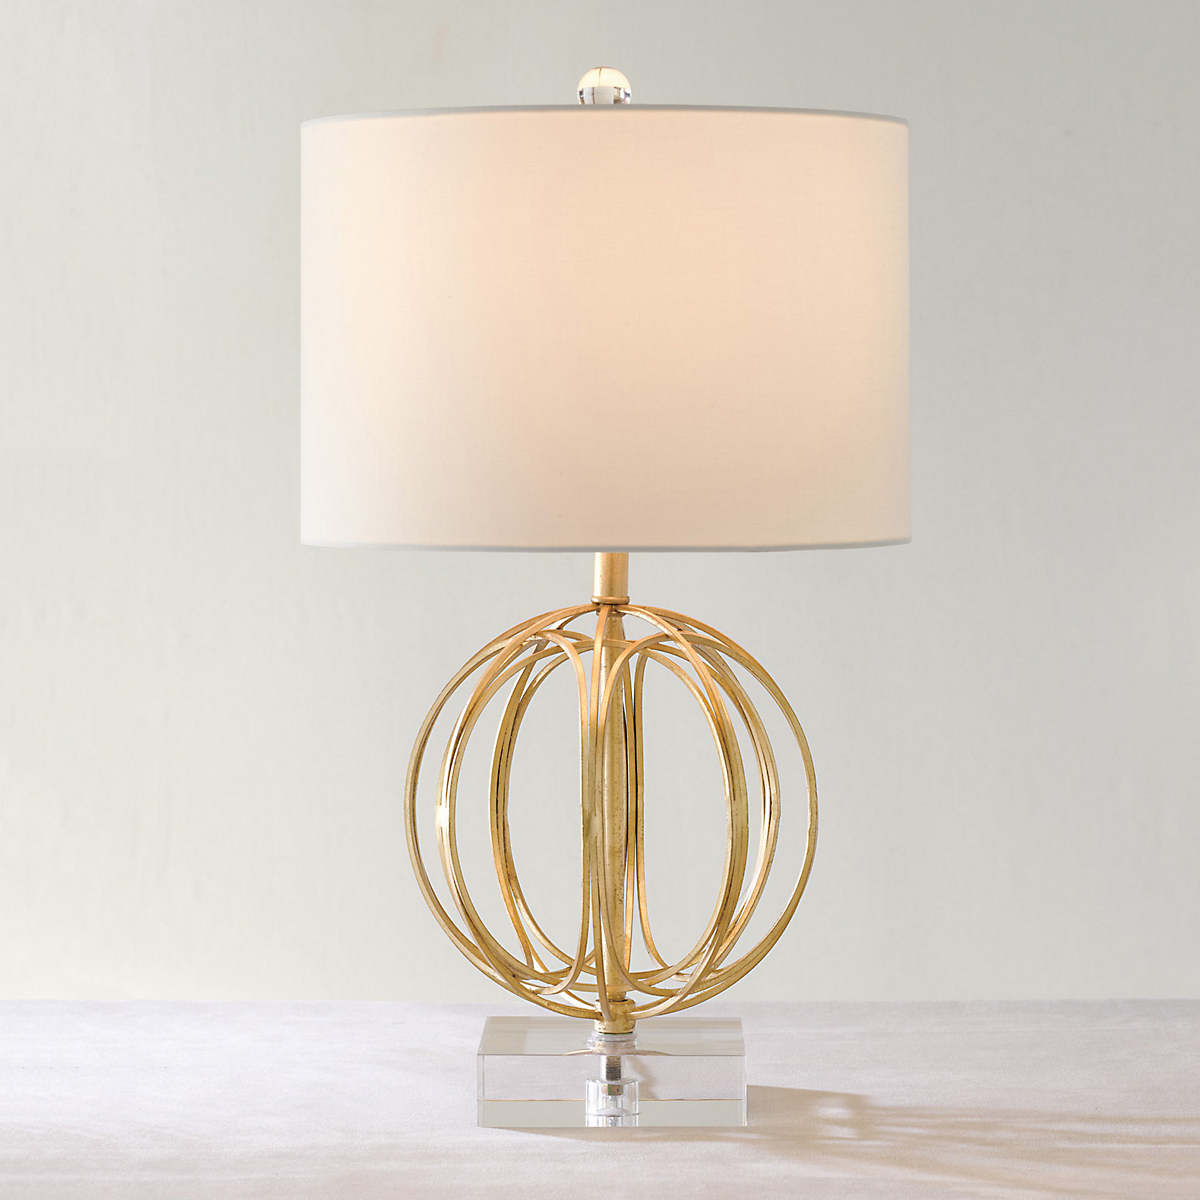 Orelia gold sphere lamp